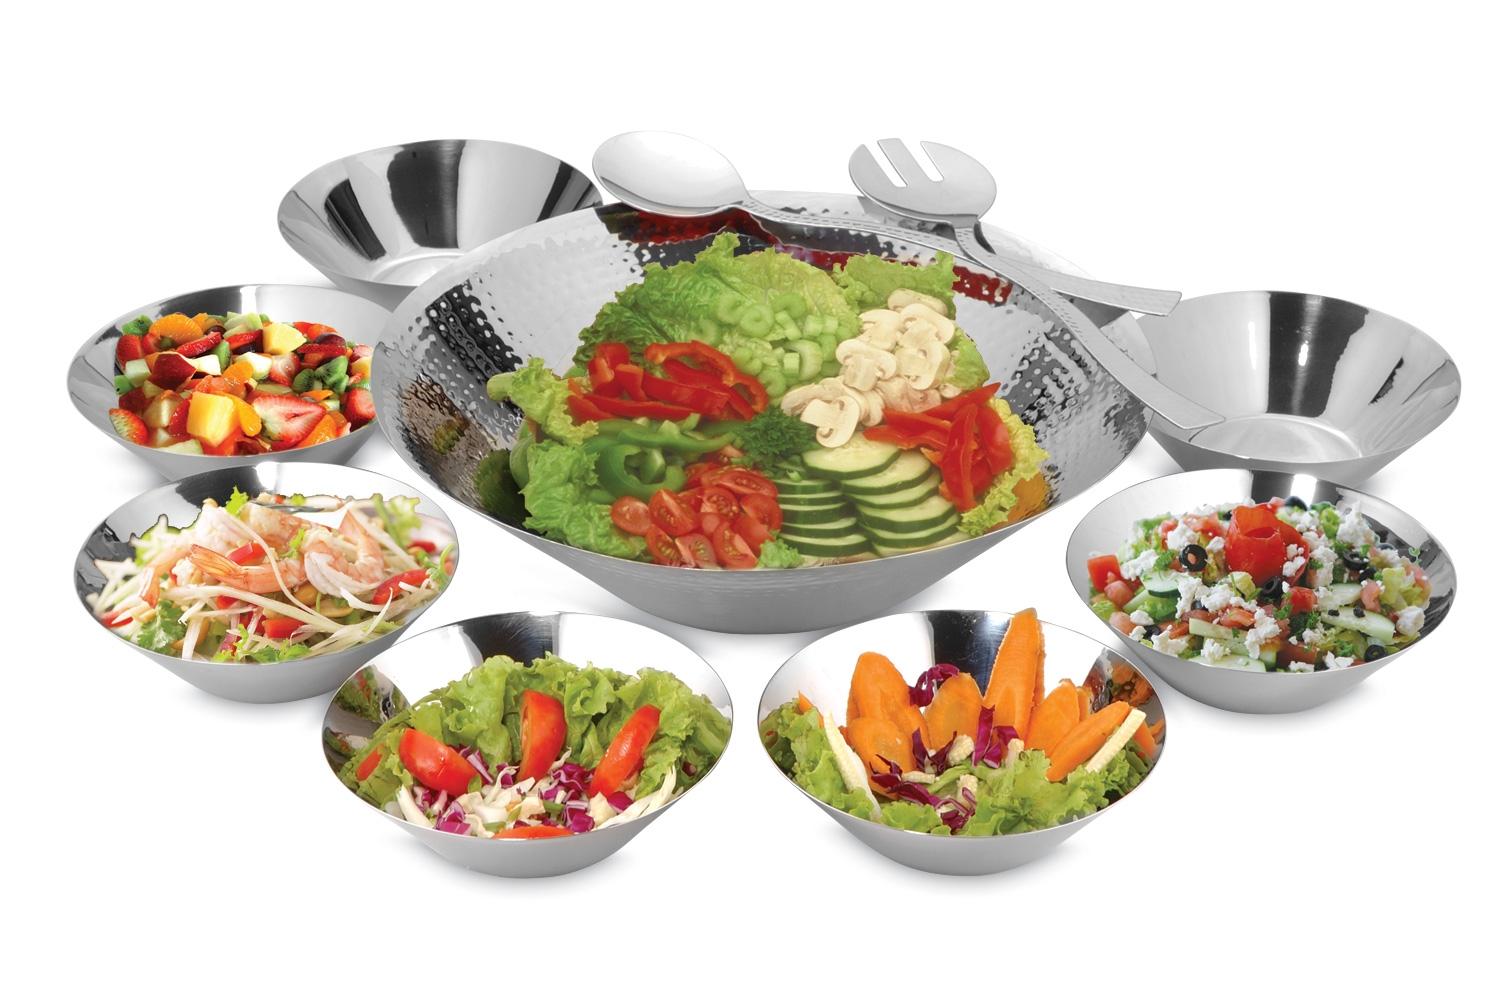 Remington salad set